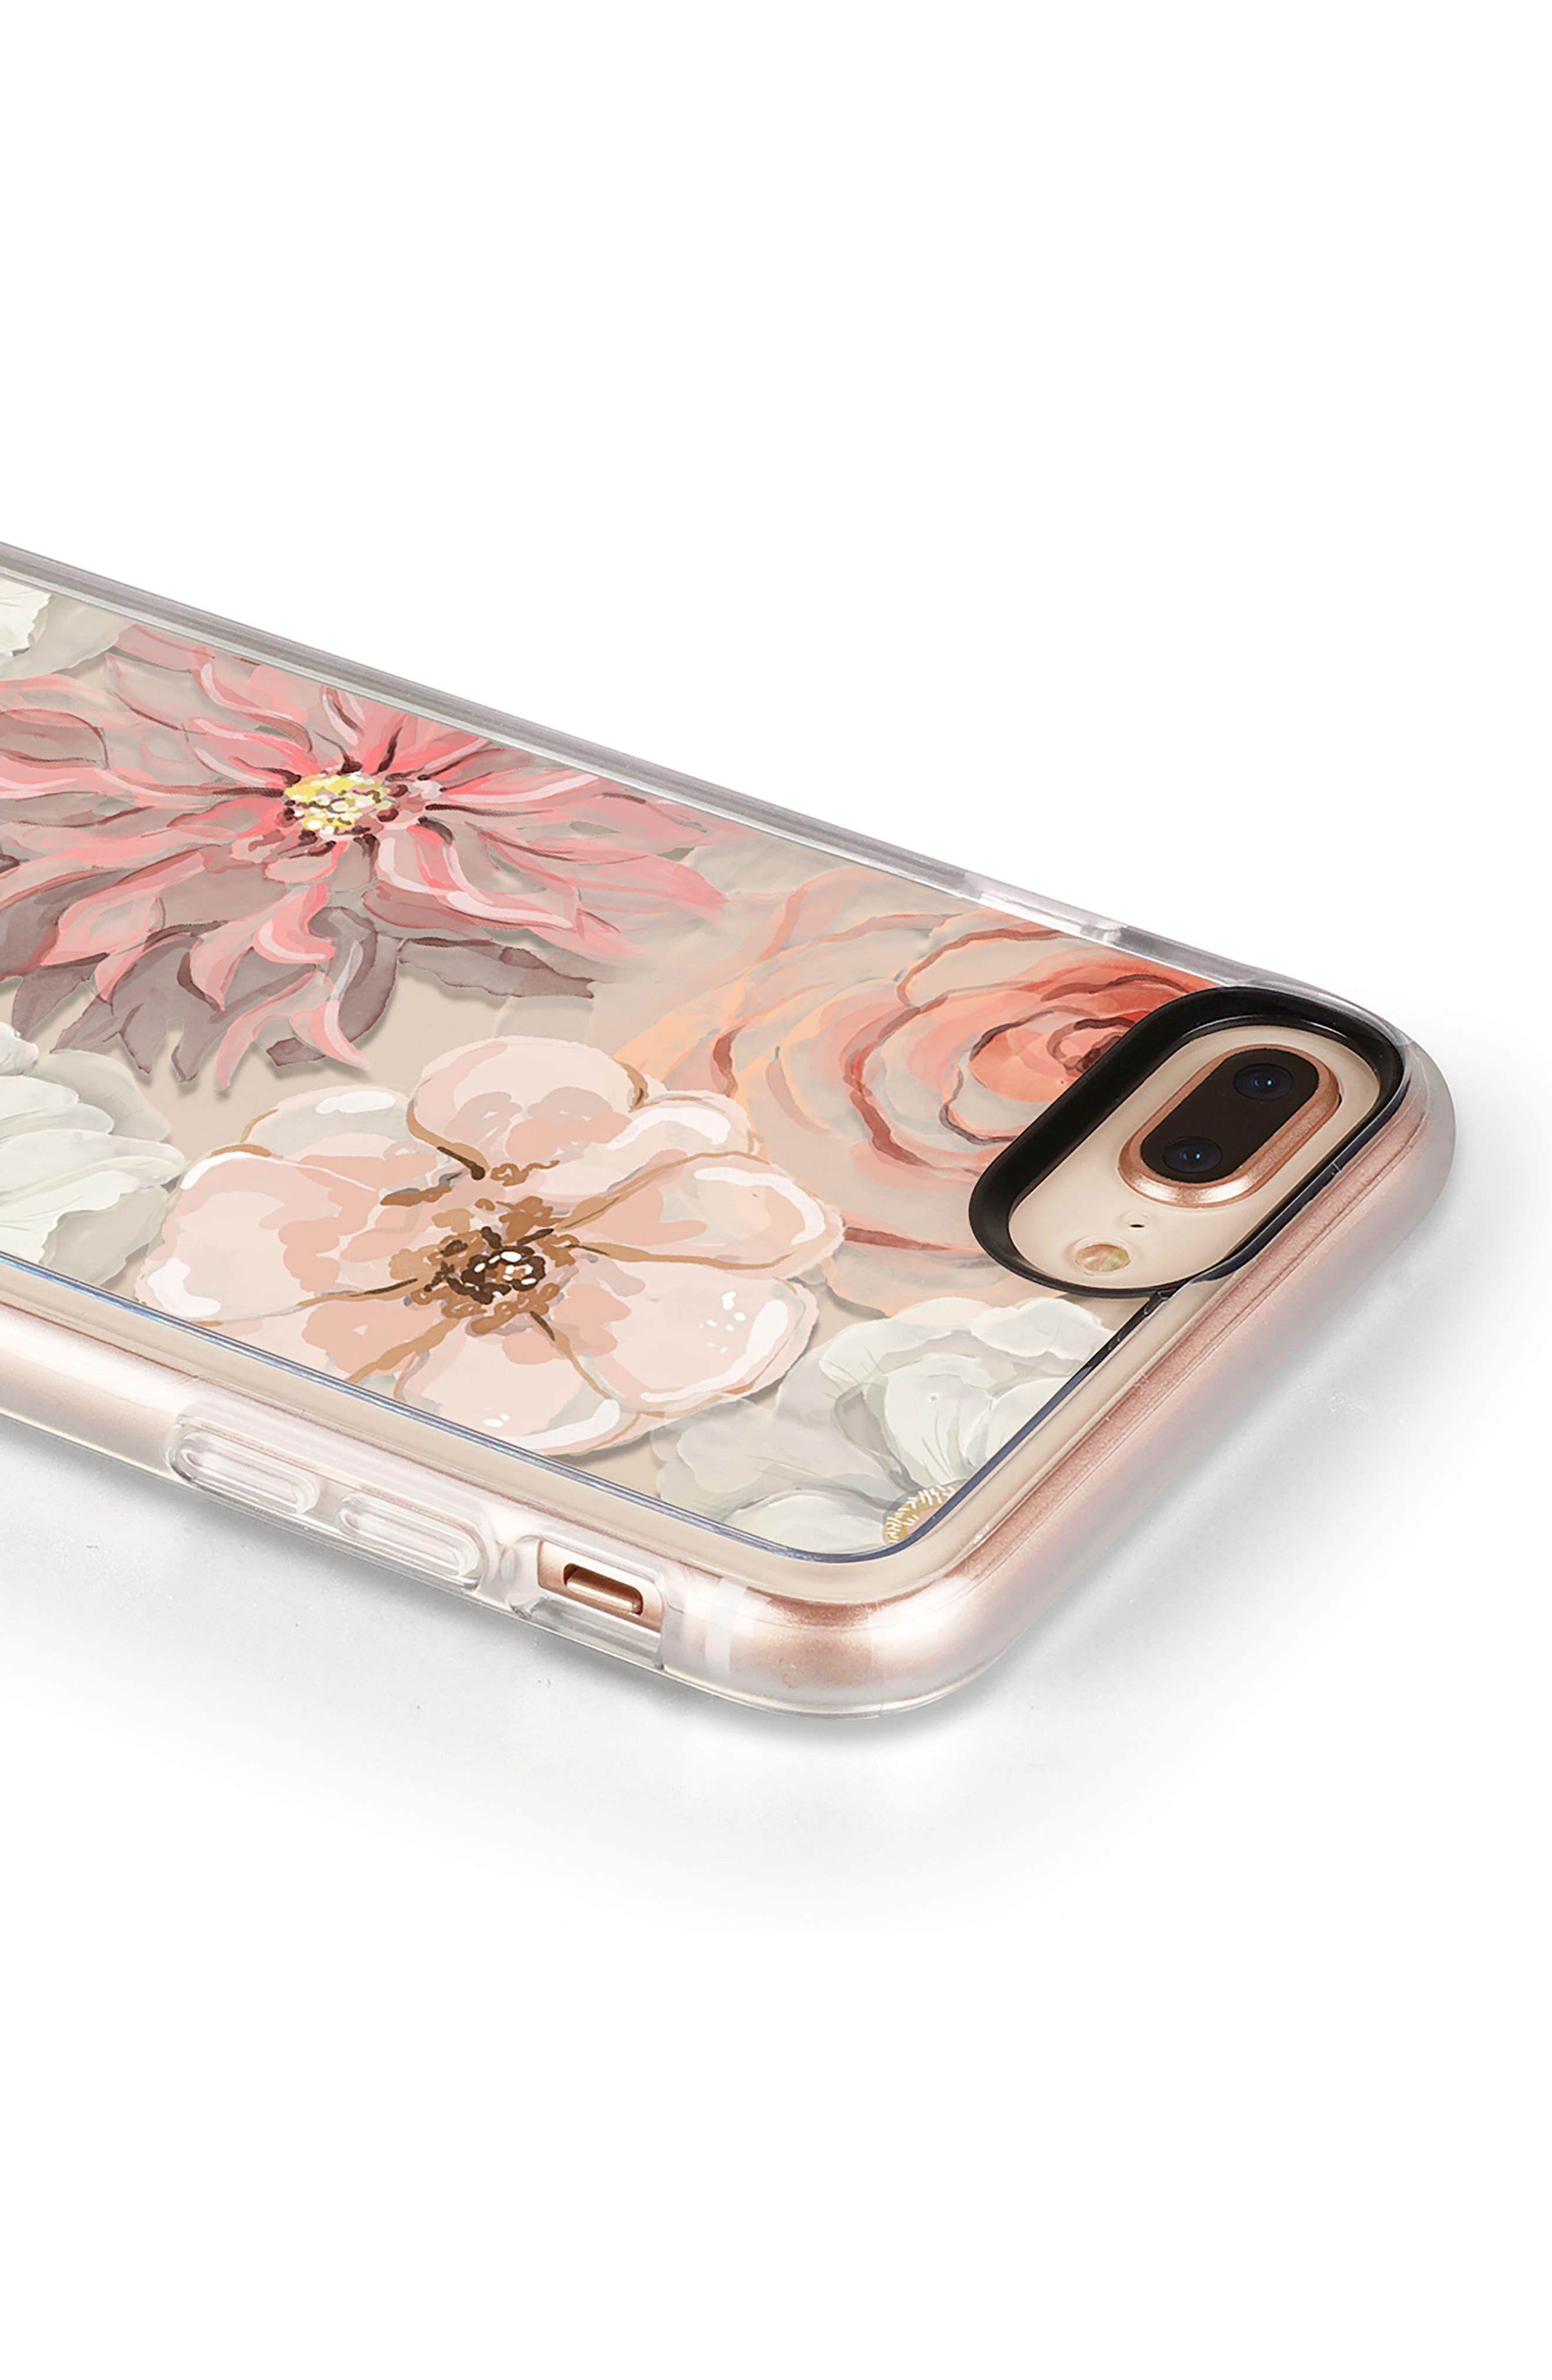 Pretty Blush iPhone 7/8 & 7/8 Plus Case,                             Alternate thumbnail 7, color,                             Blush Pink